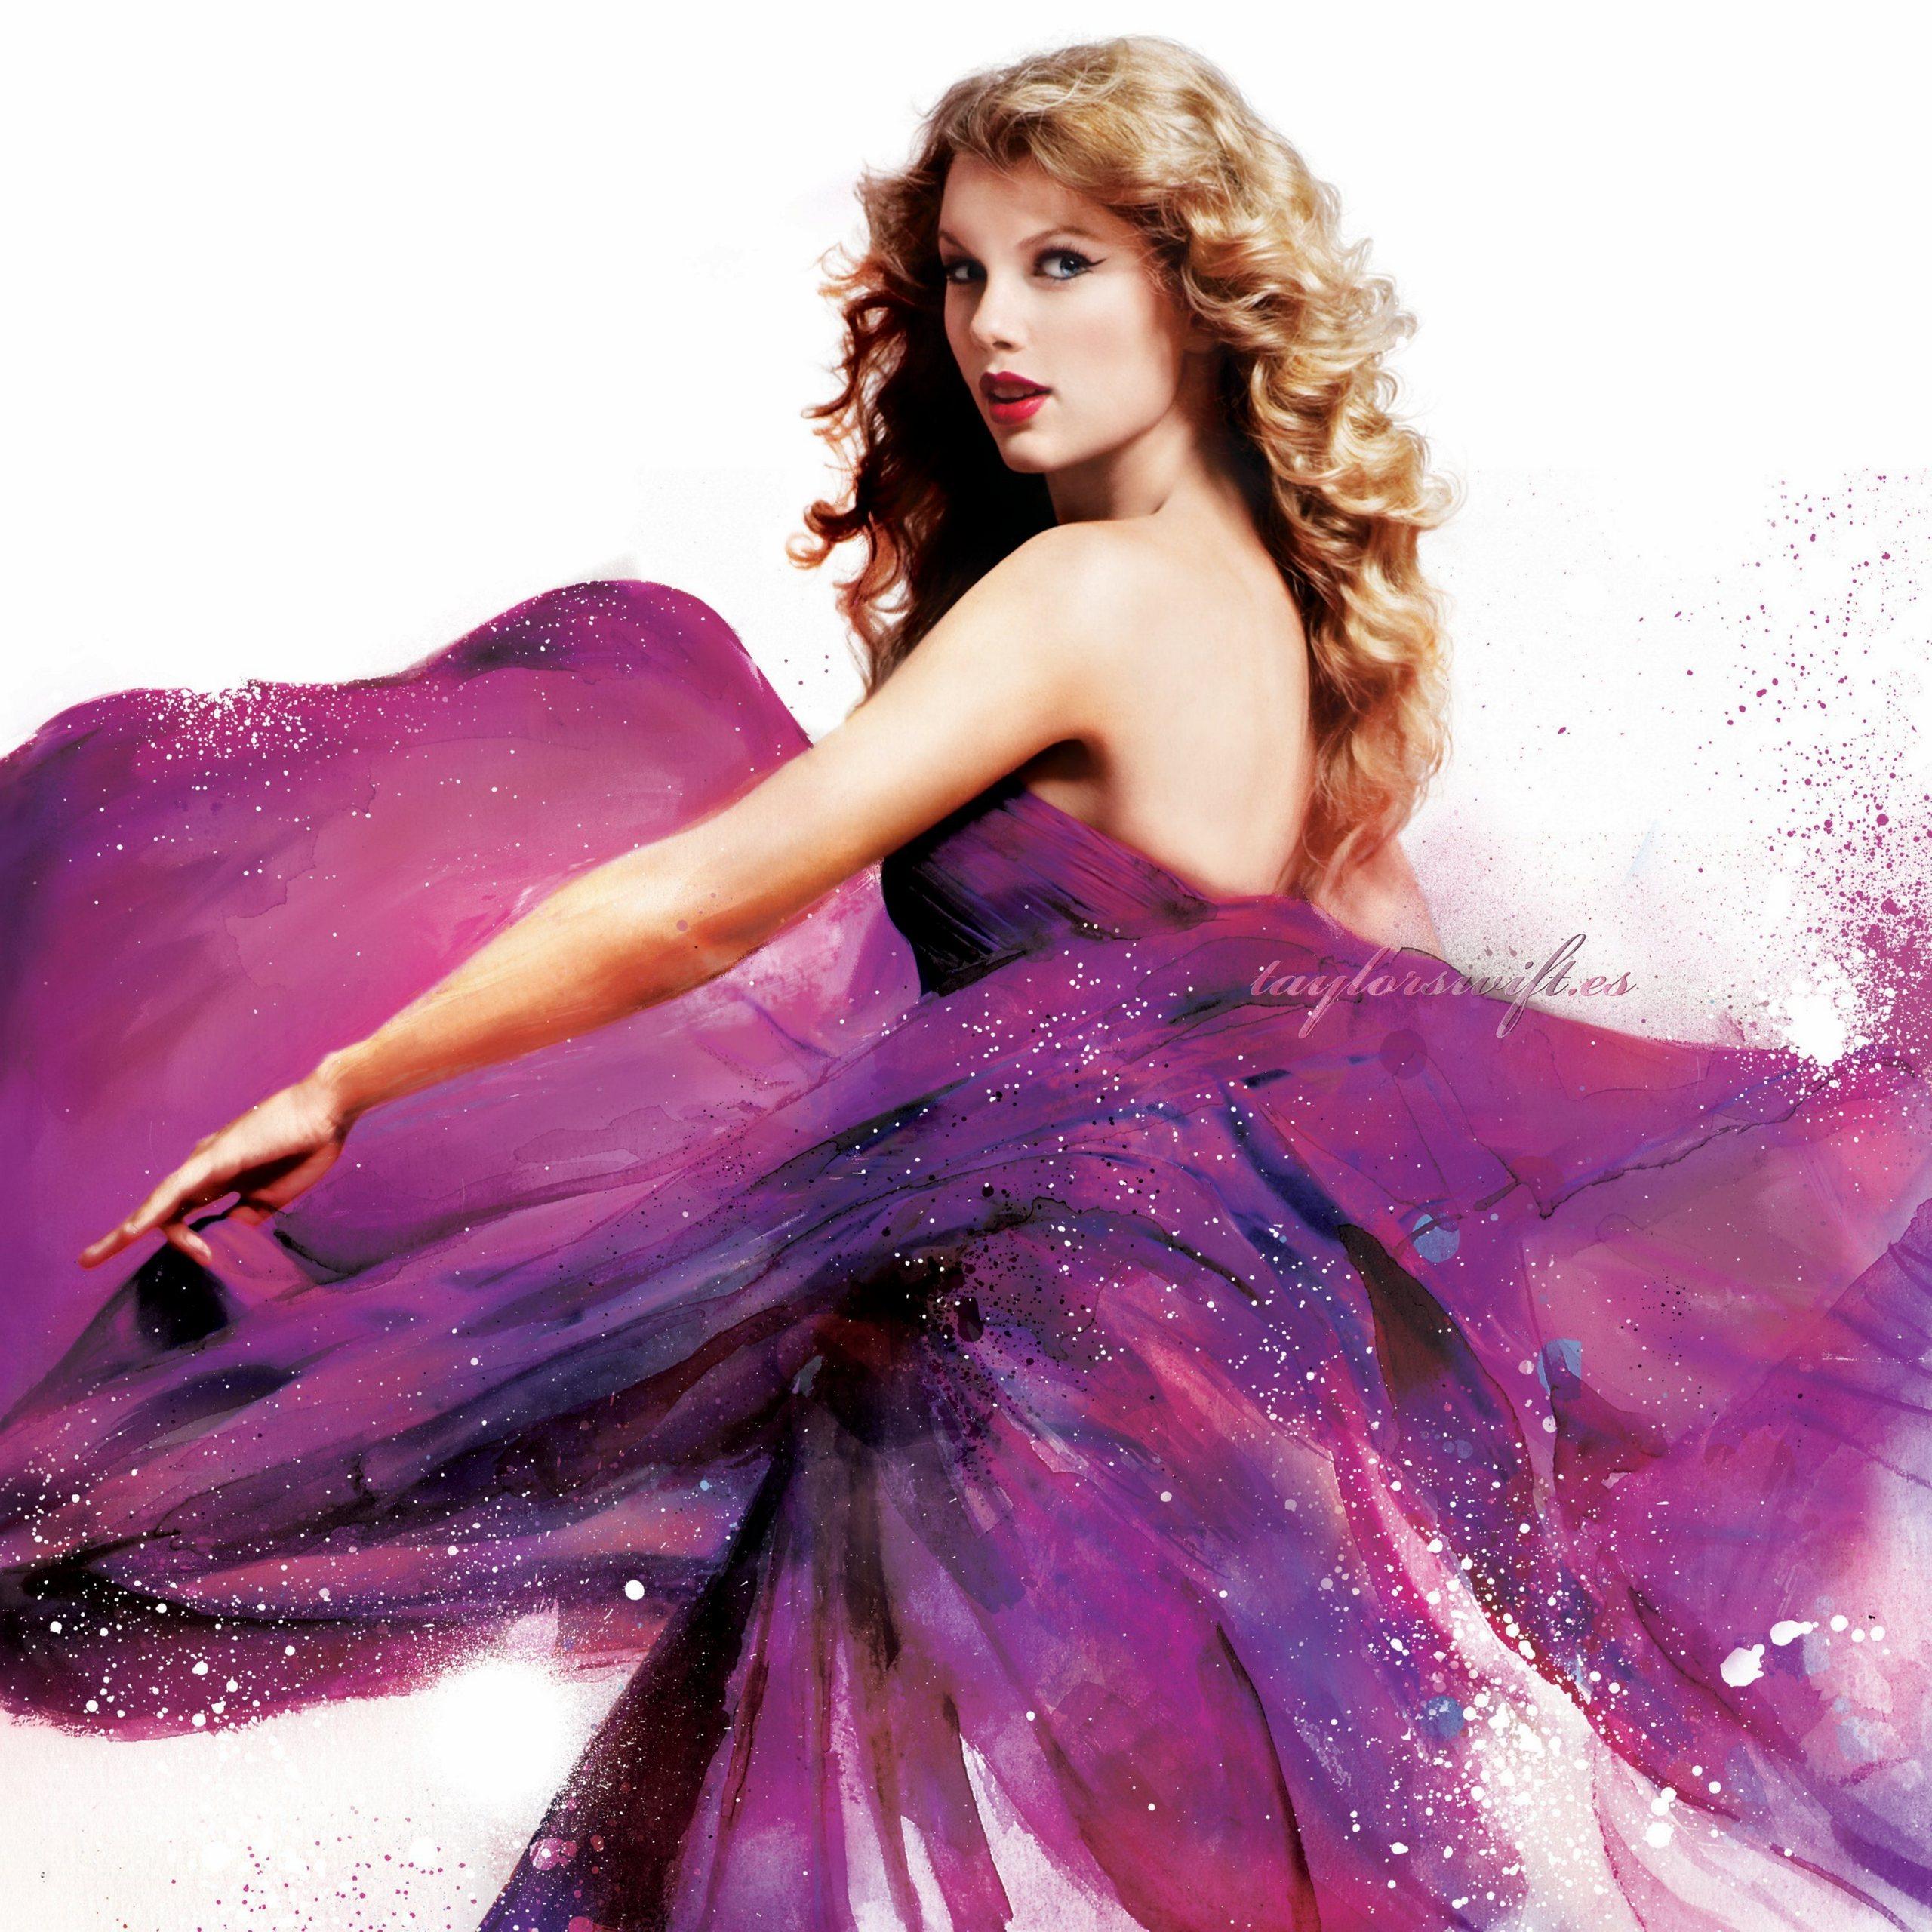 Anichu90 Taylor Swift - Photoshoot #110: Speak Now album (2010)